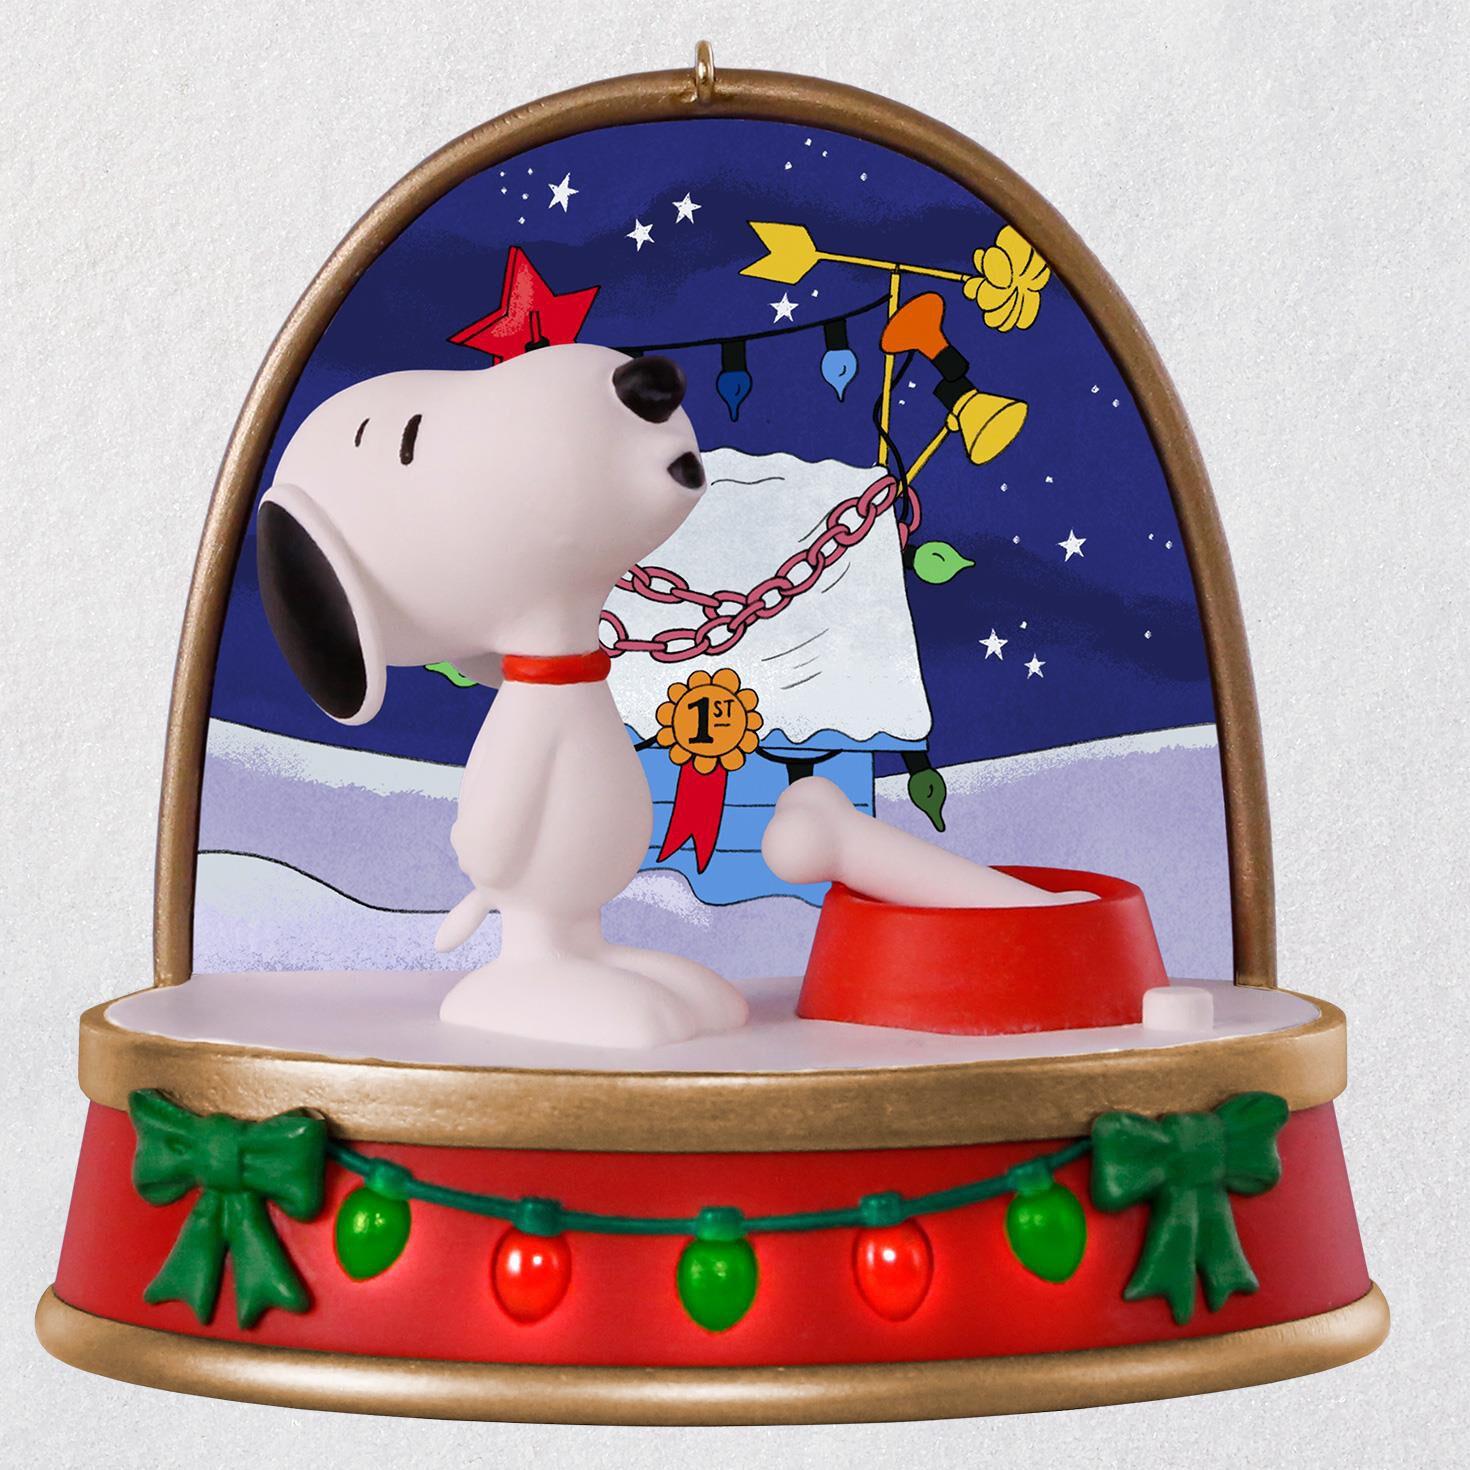 a charlie brown christmas snoopy ornament with sound and light keepsake ornaments hallmark - Charlie Brown And Snoopy Christmas Decorations